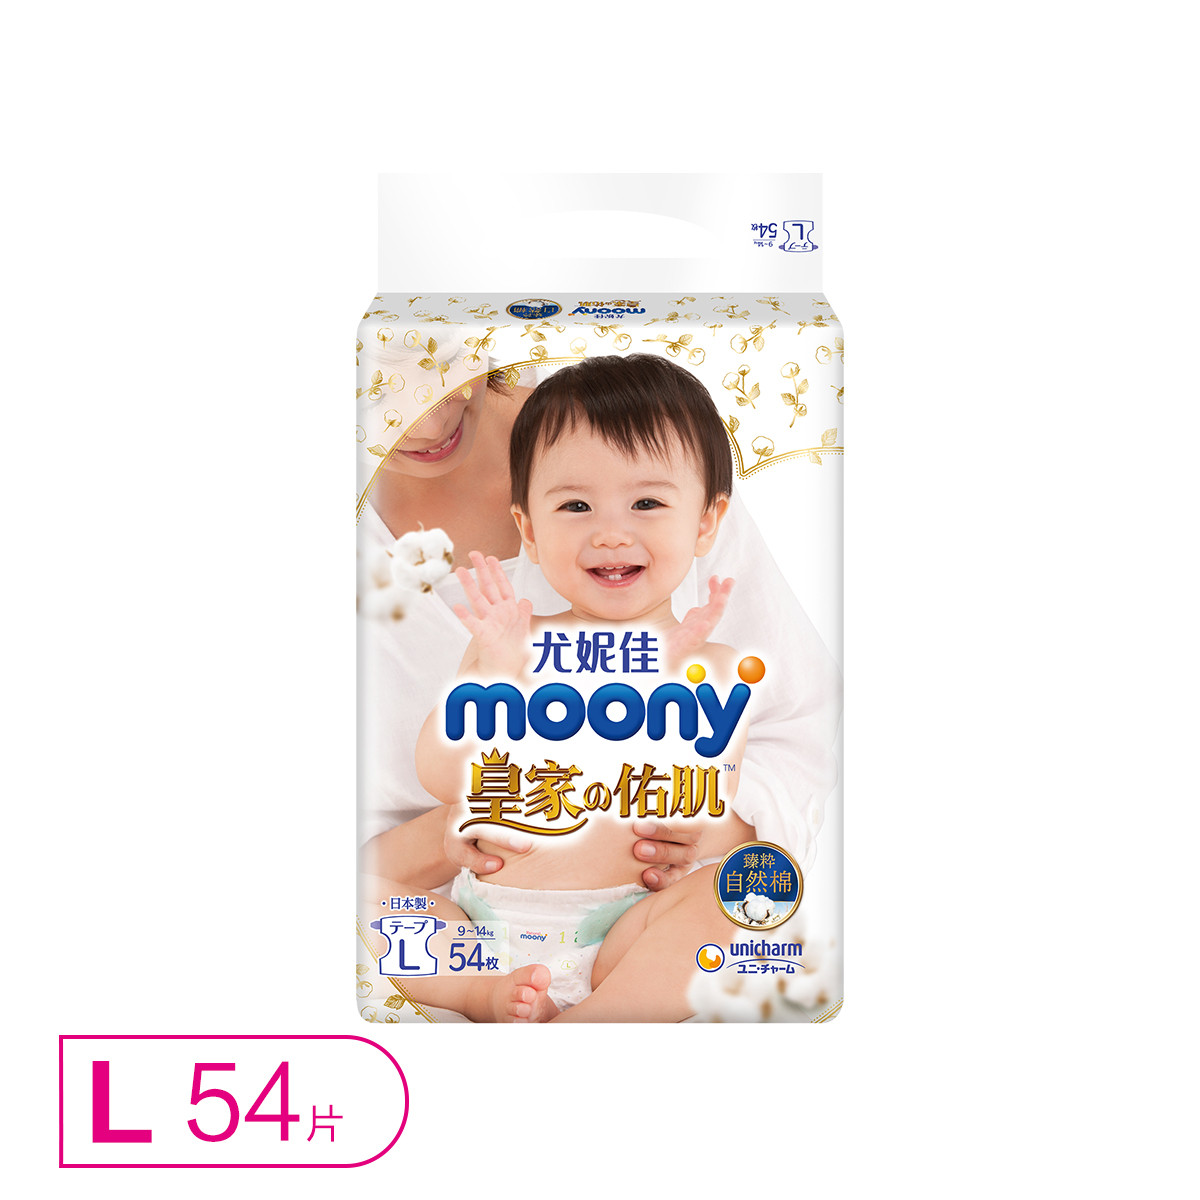 L54日本尤妮佳moony皇家系列婴儿纸尿裤L54 宝宝尿不湿